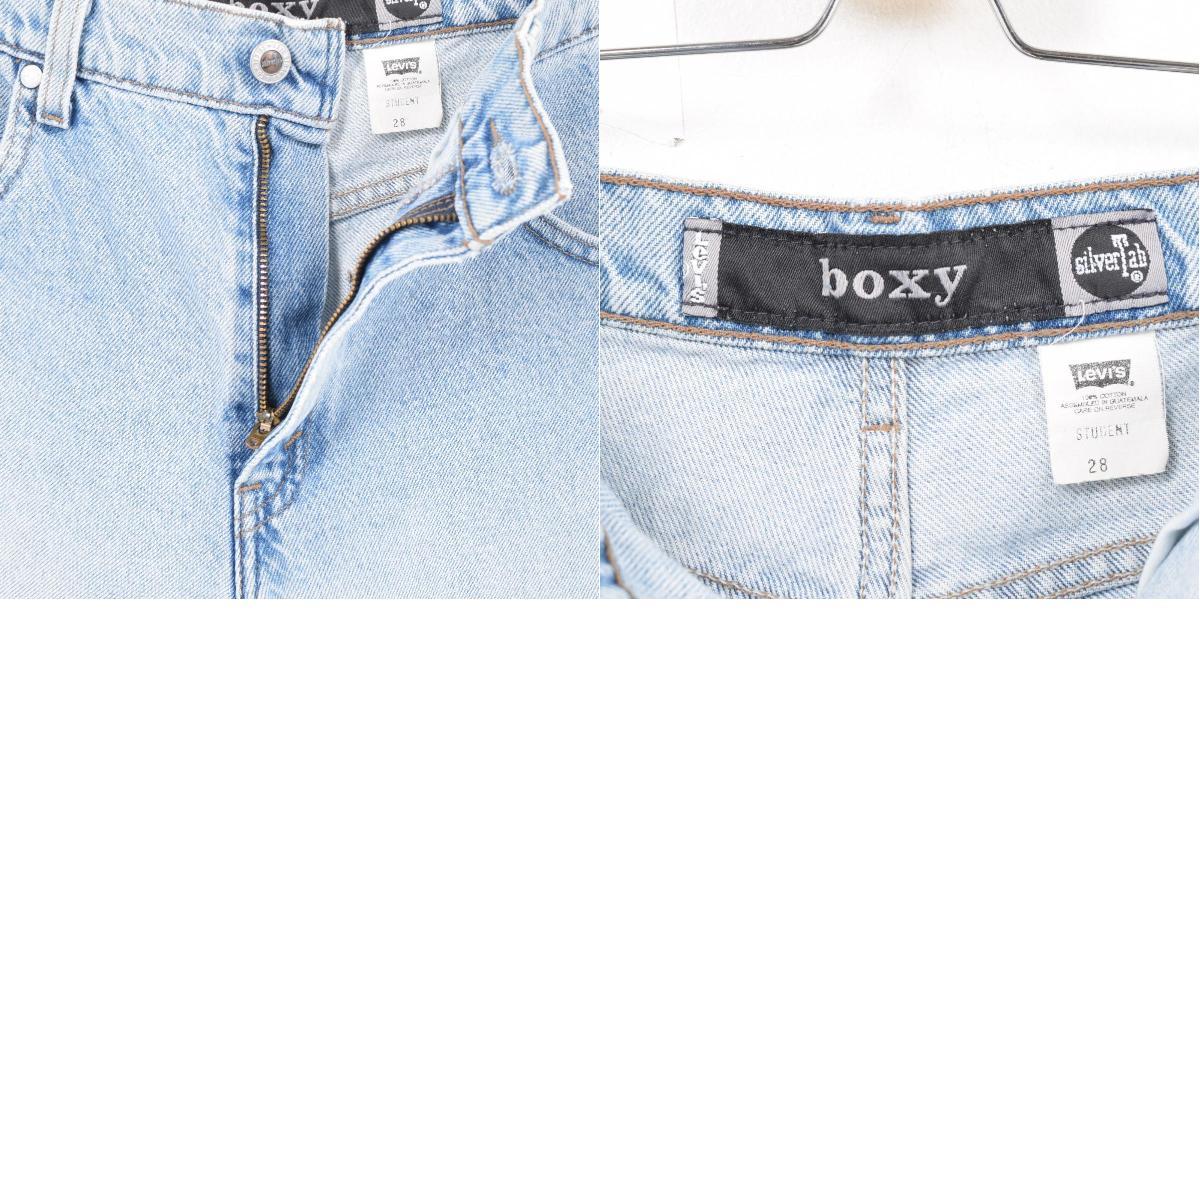 23ce5d7c 90s Levis Levi's SILVER TAB silver tab BOXY denim shorts short pants men  w30 /war9734